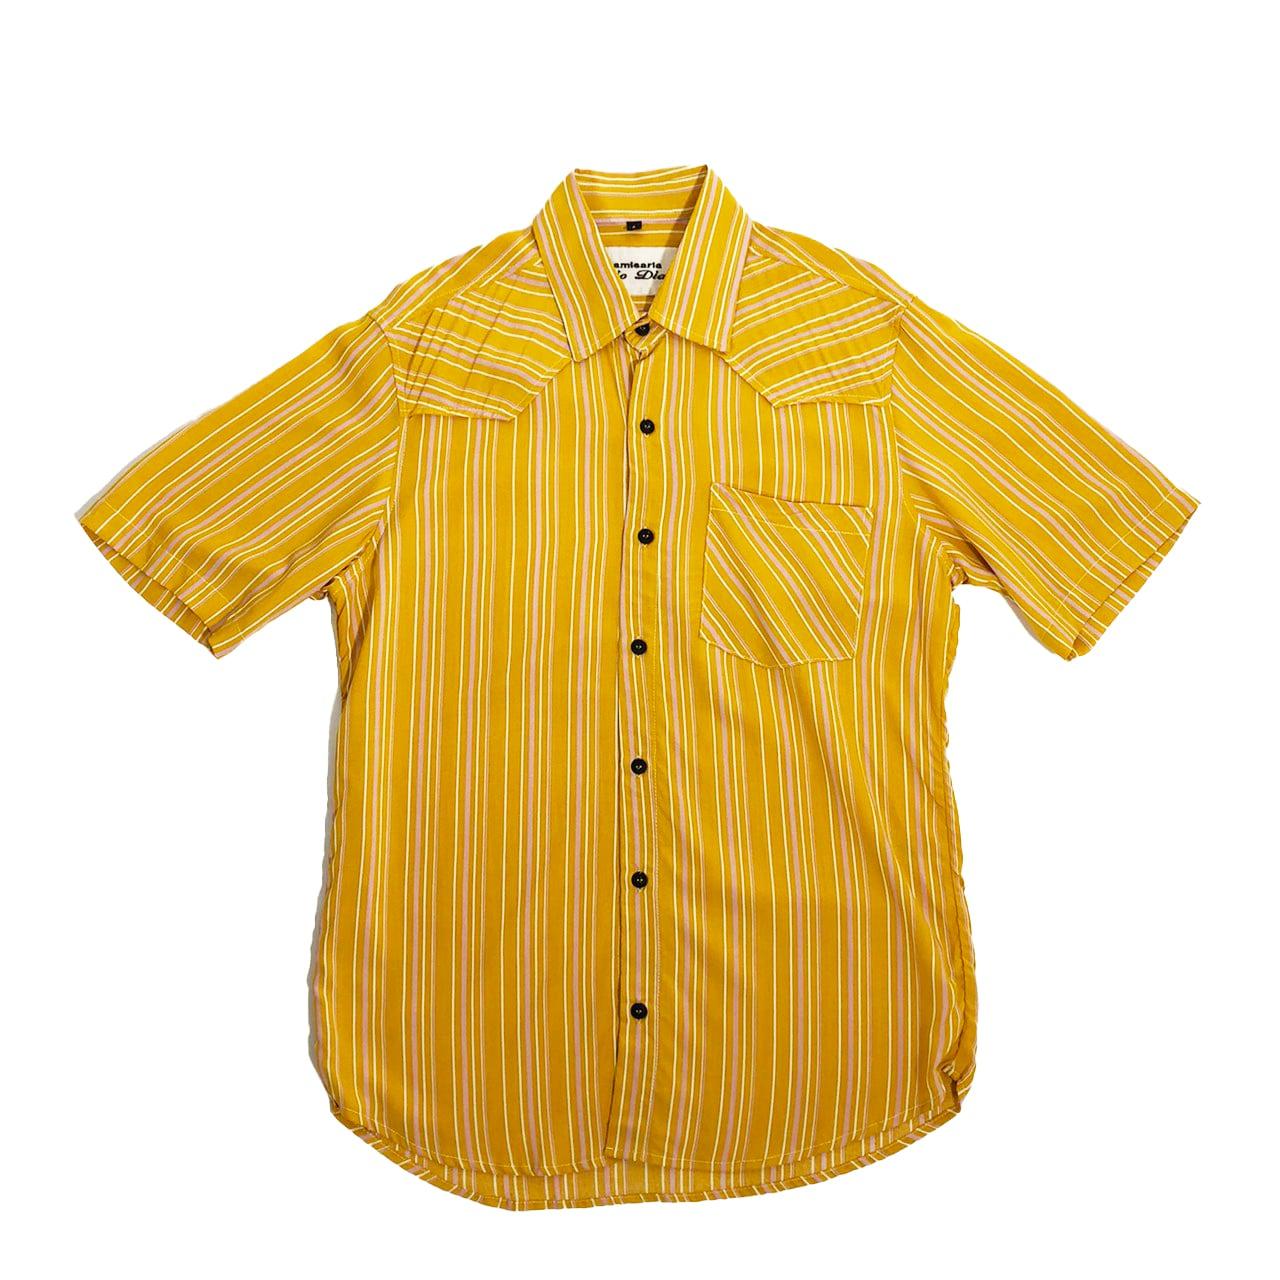 Caio Dias_Viscose Print Shirt:Yellow